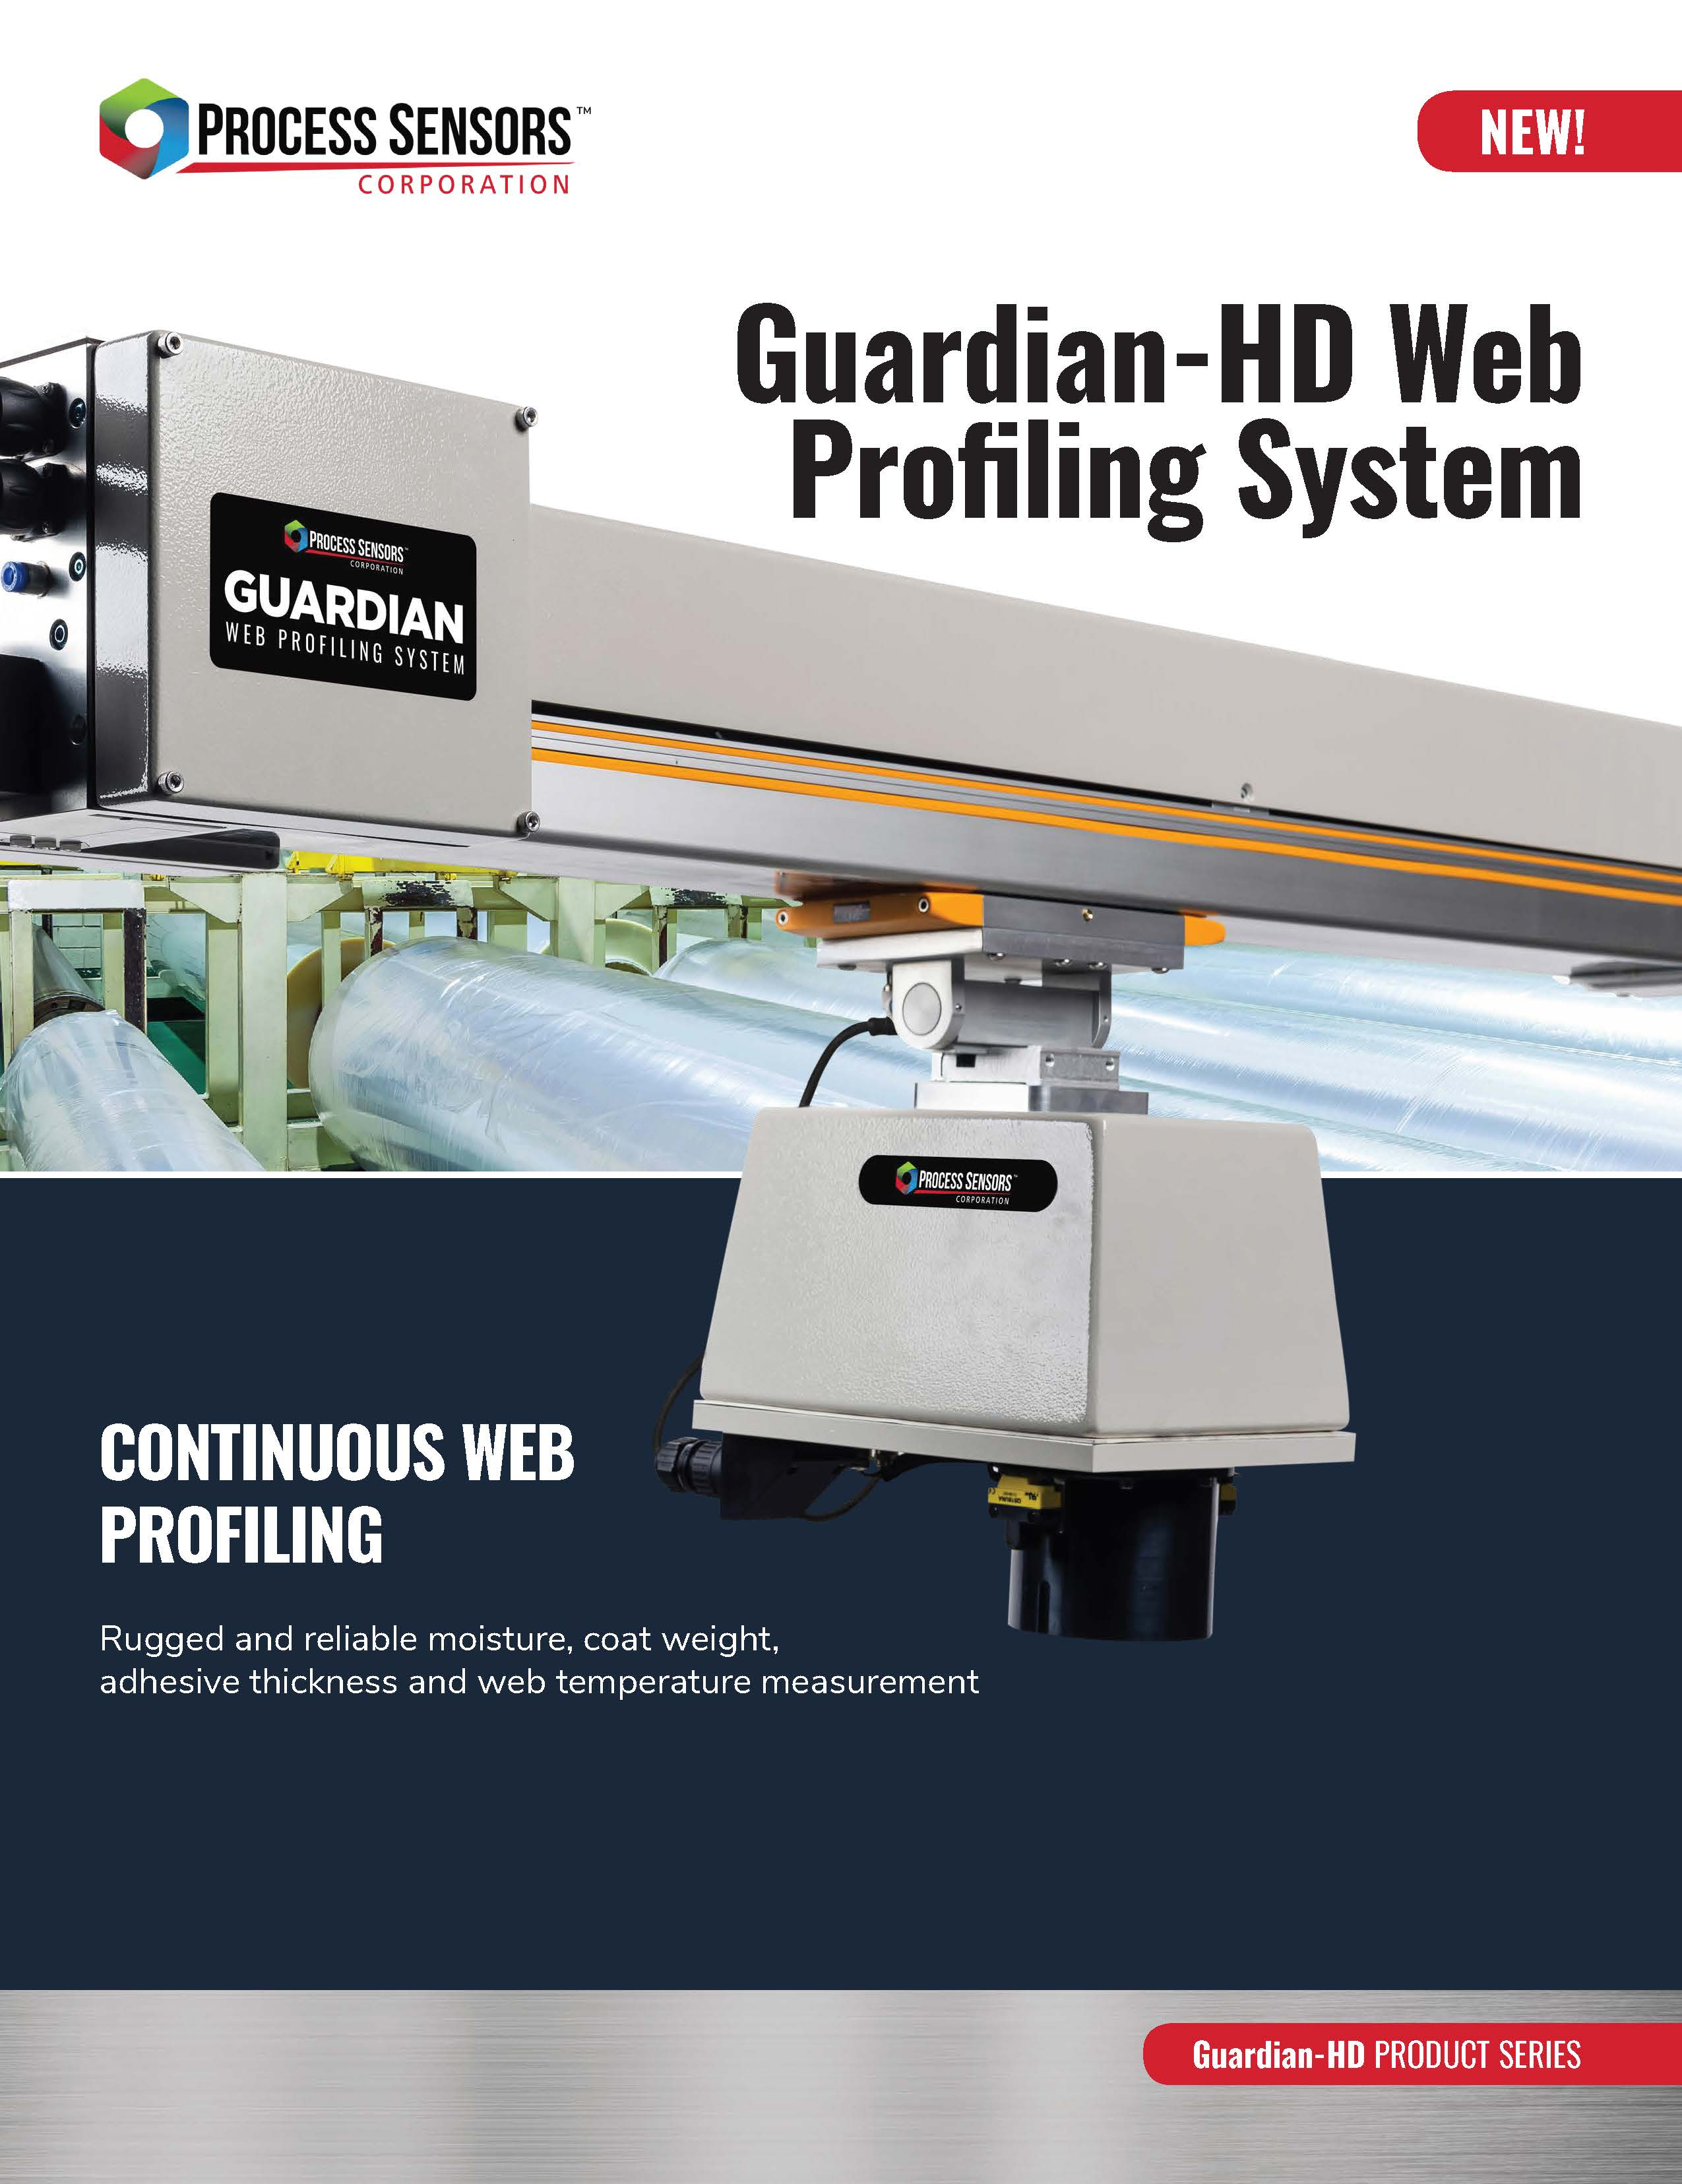 Guardian-HD Web Profiling System